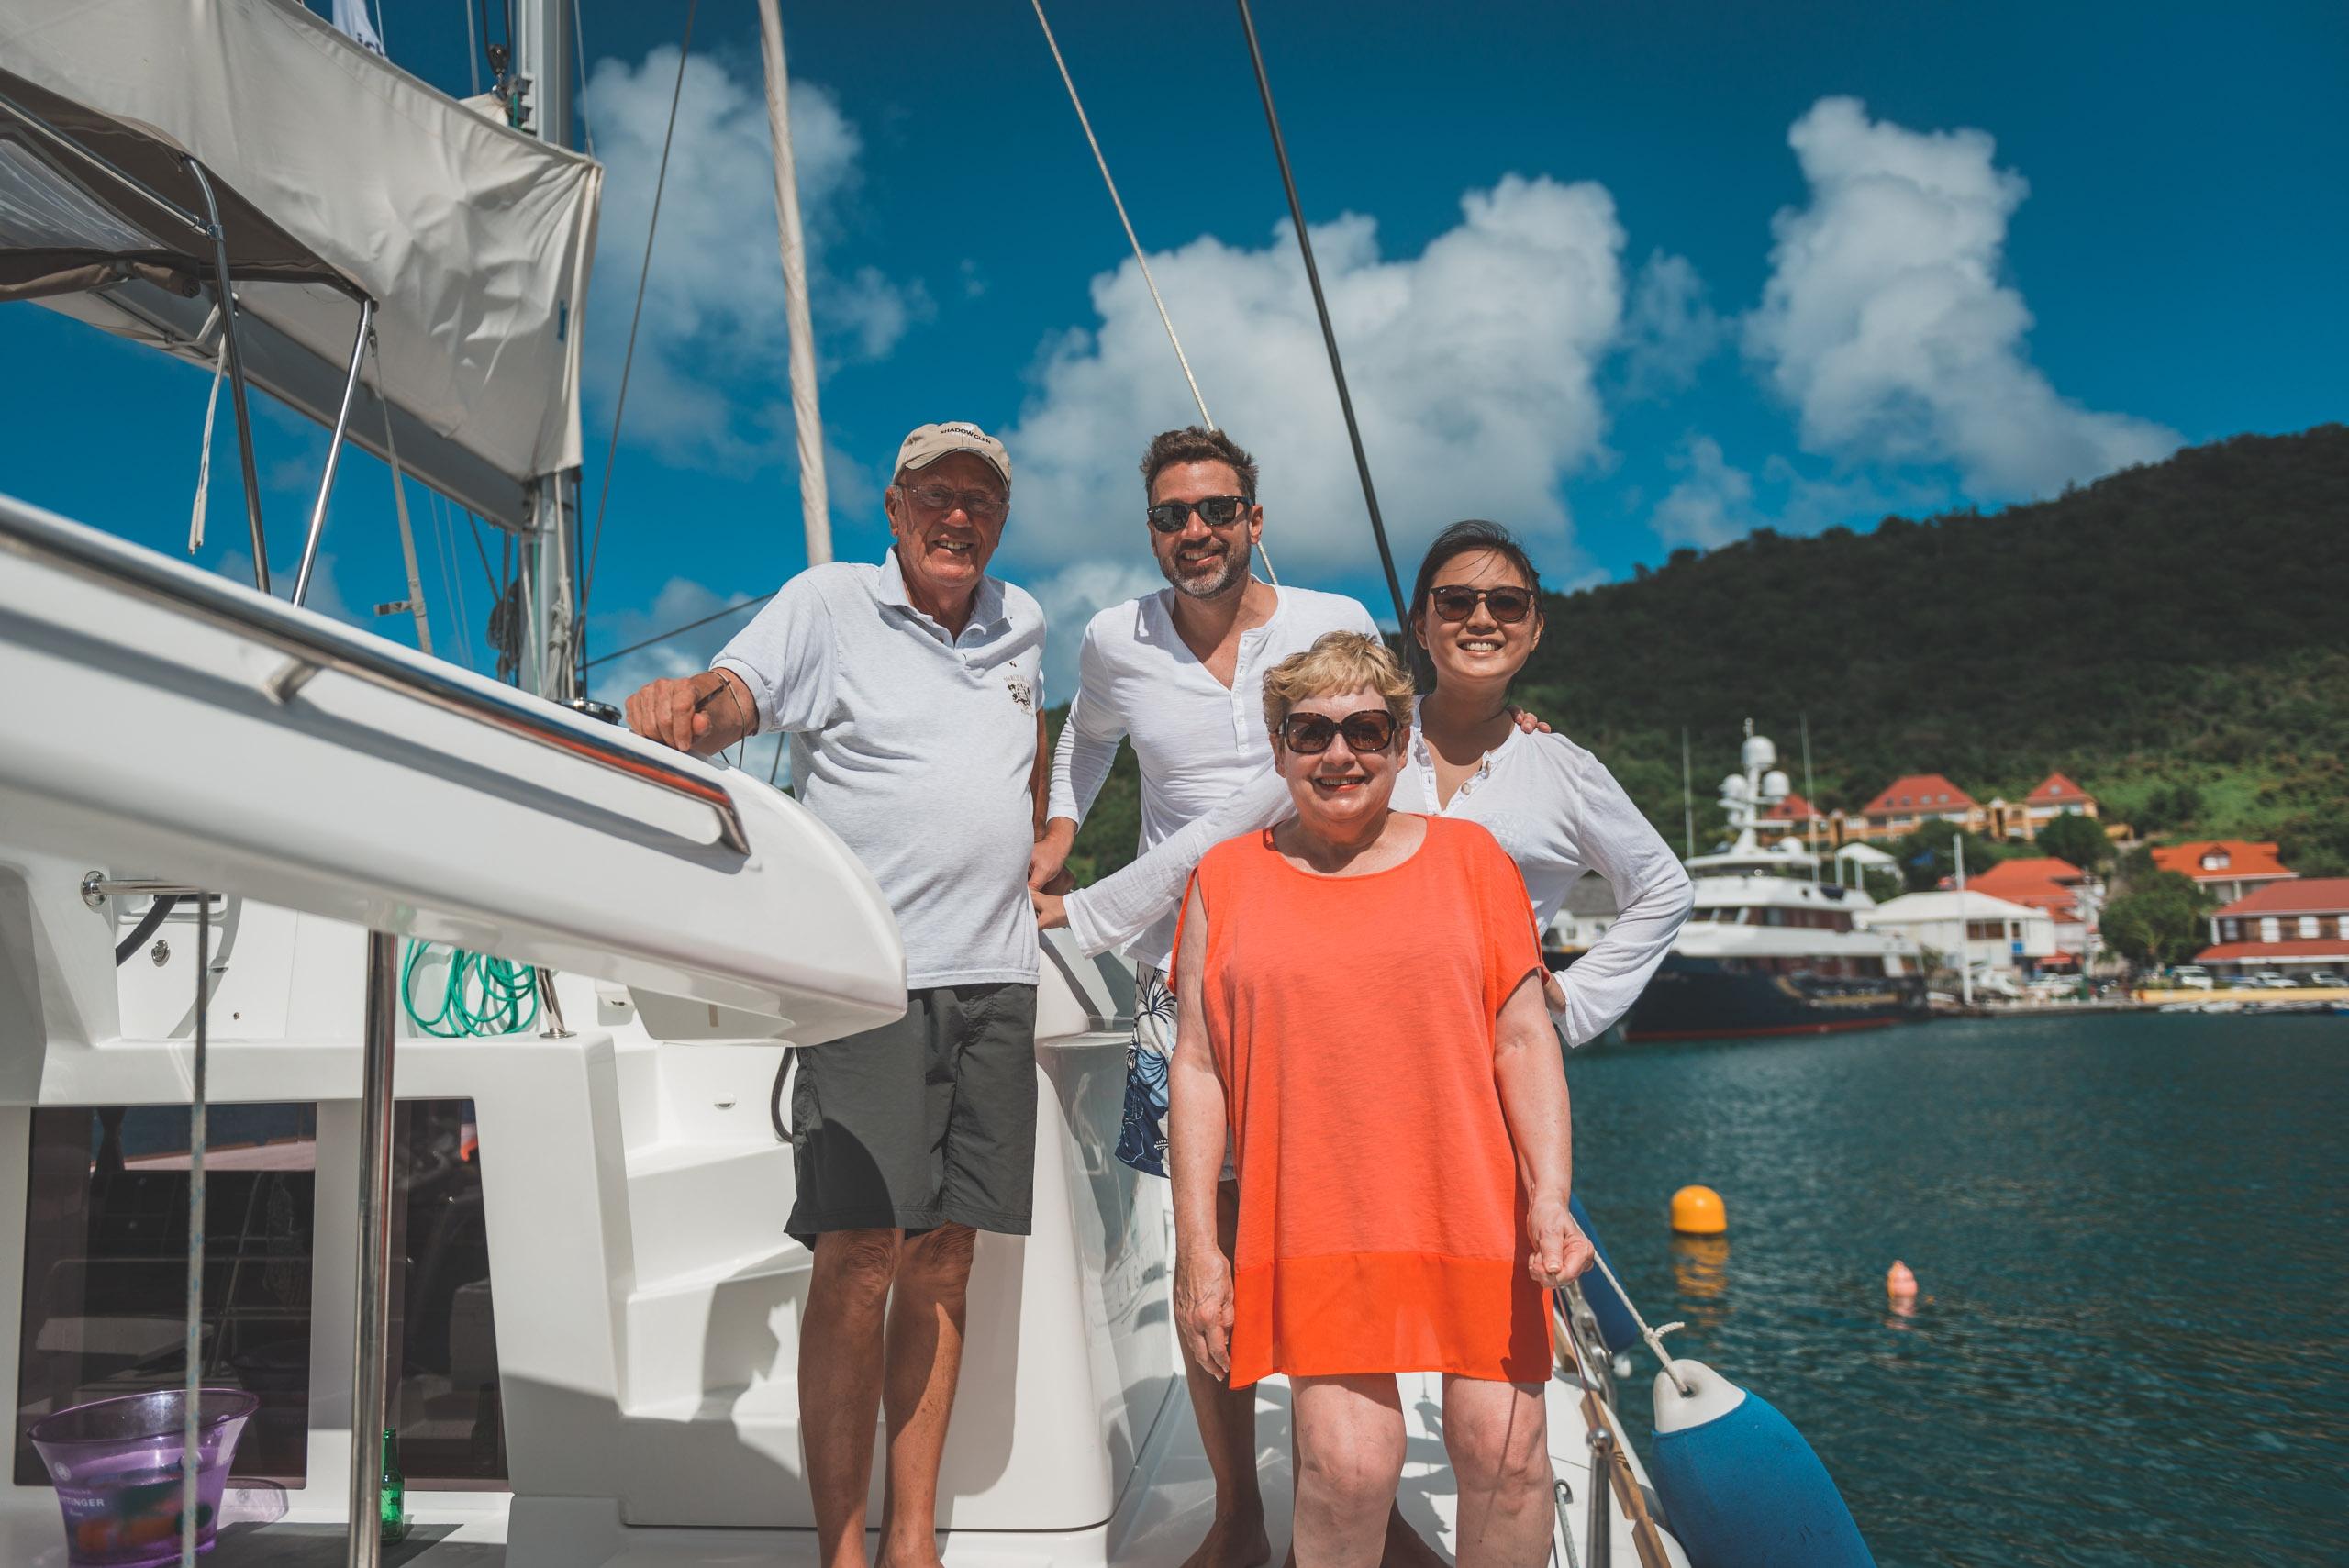 The Whole Crew at Gustavia Harbor